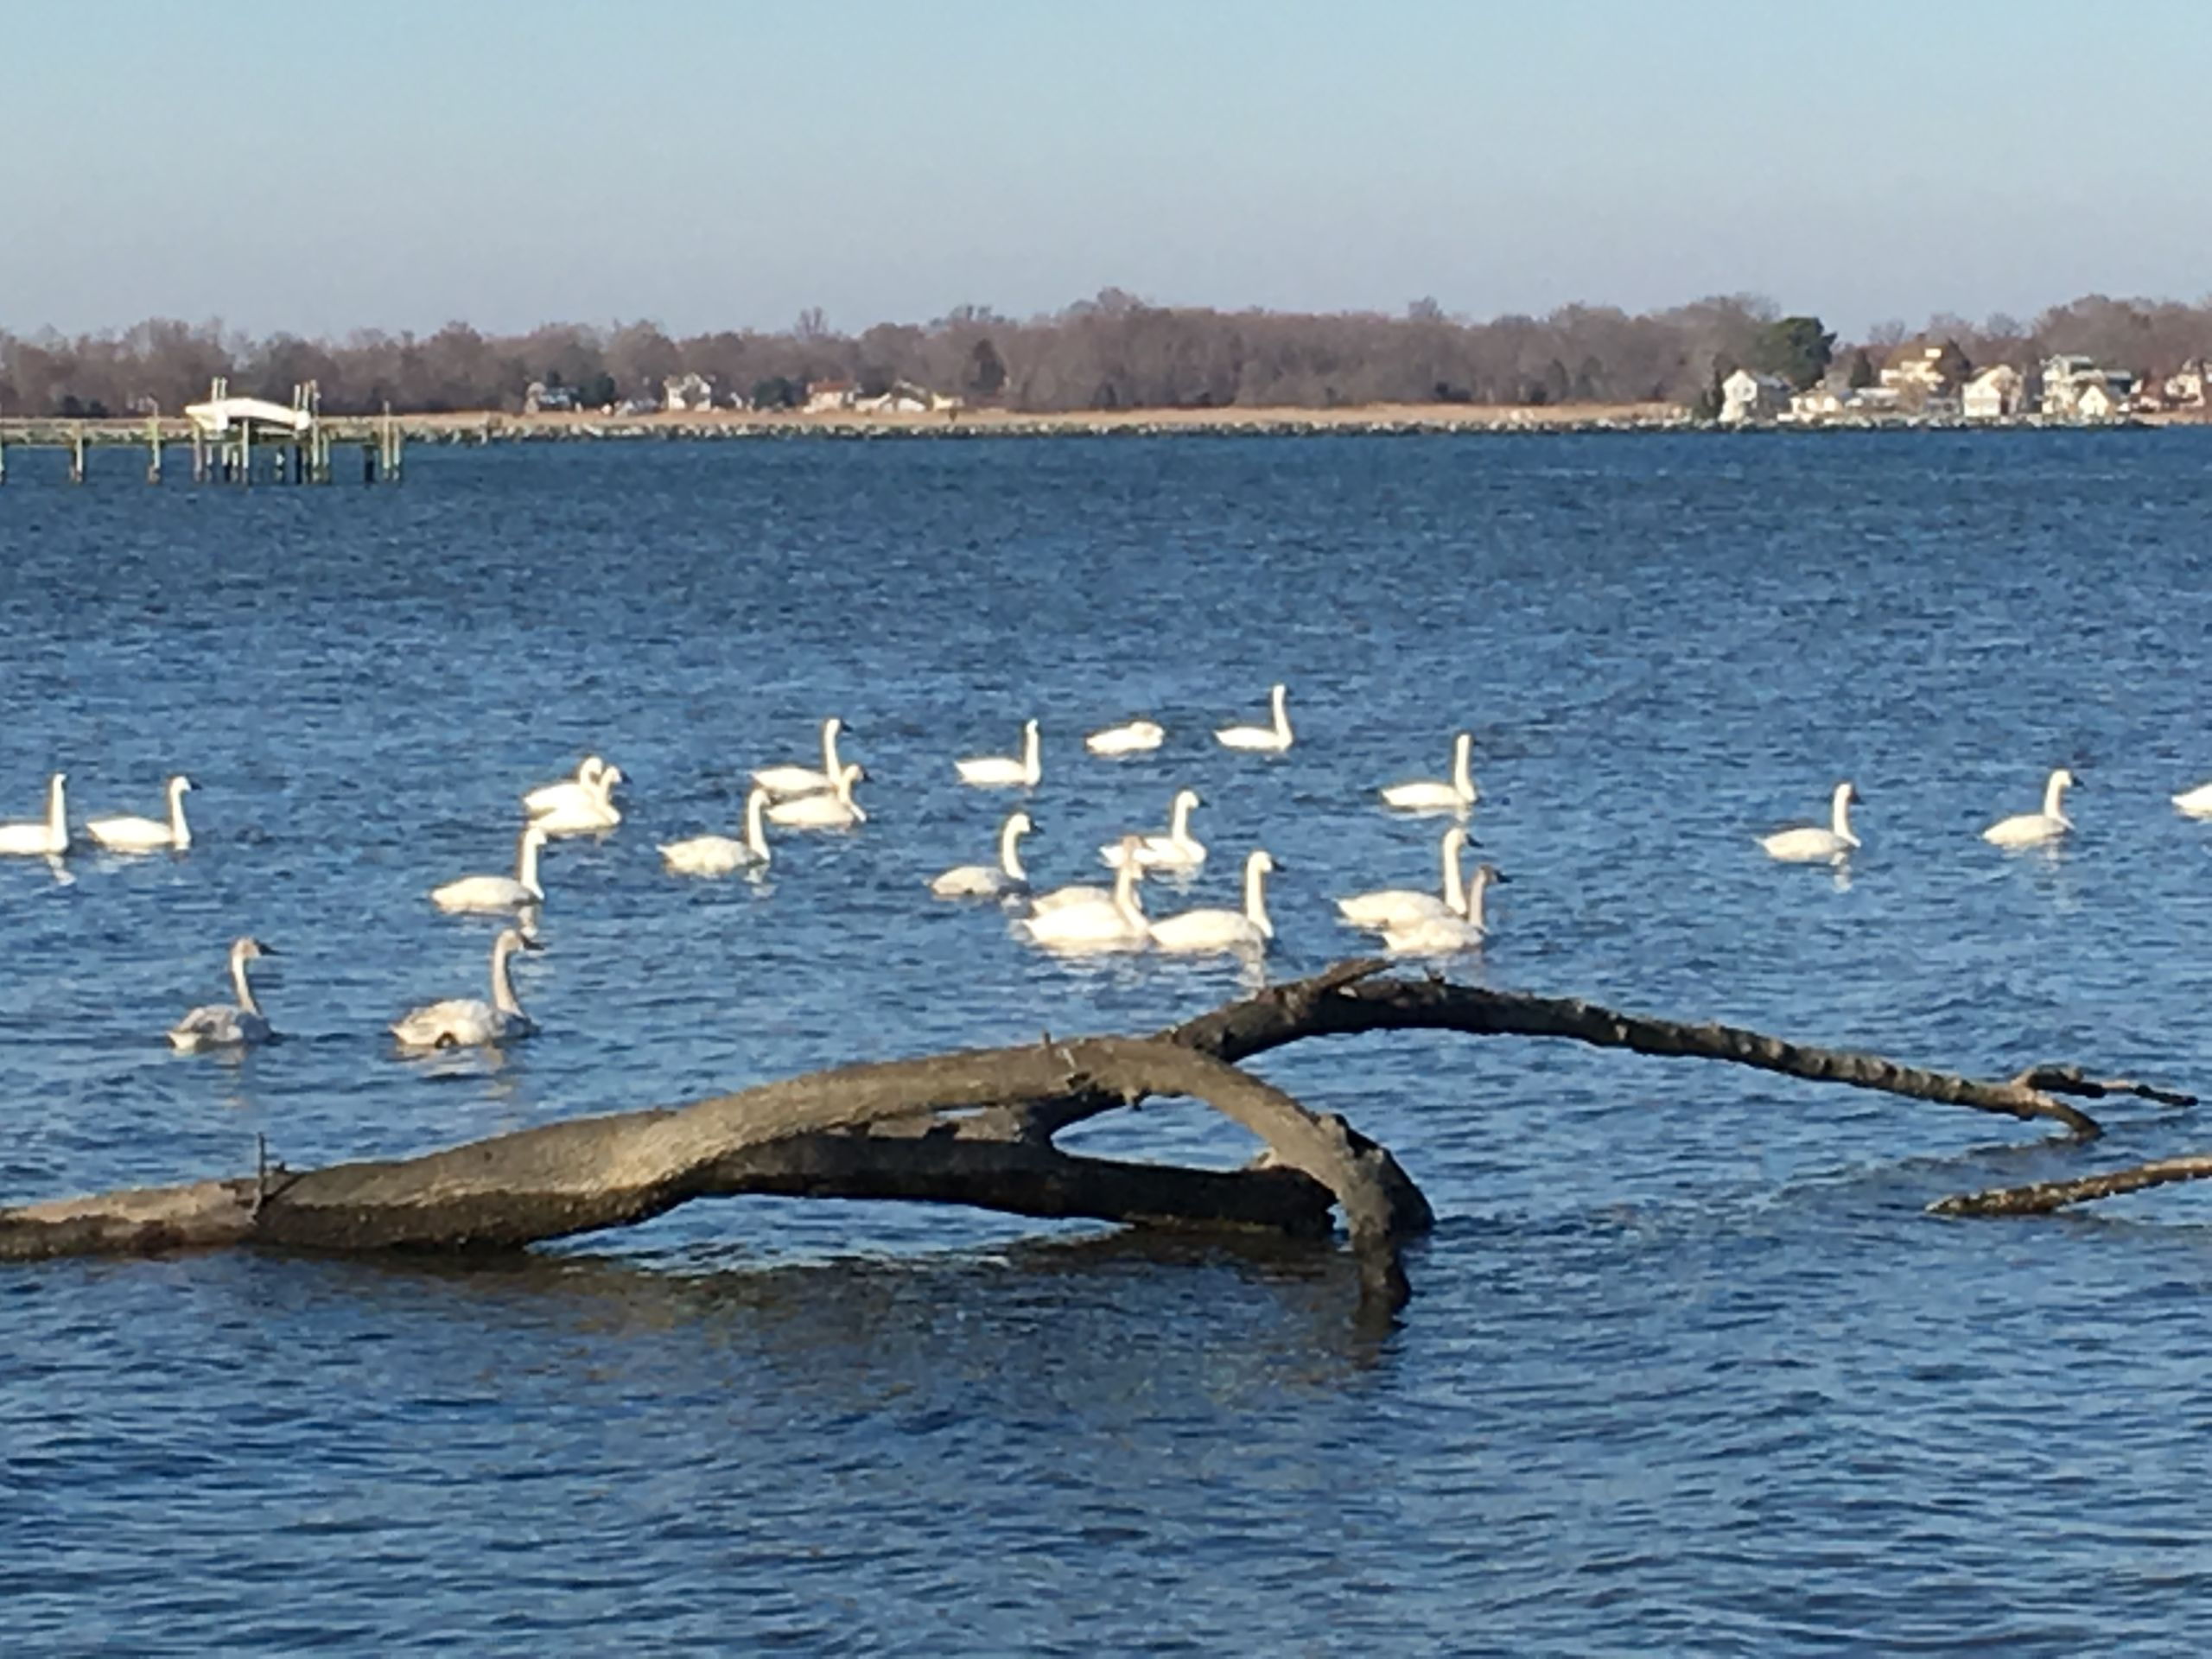 Tundra Swans on Chesapeake Bay